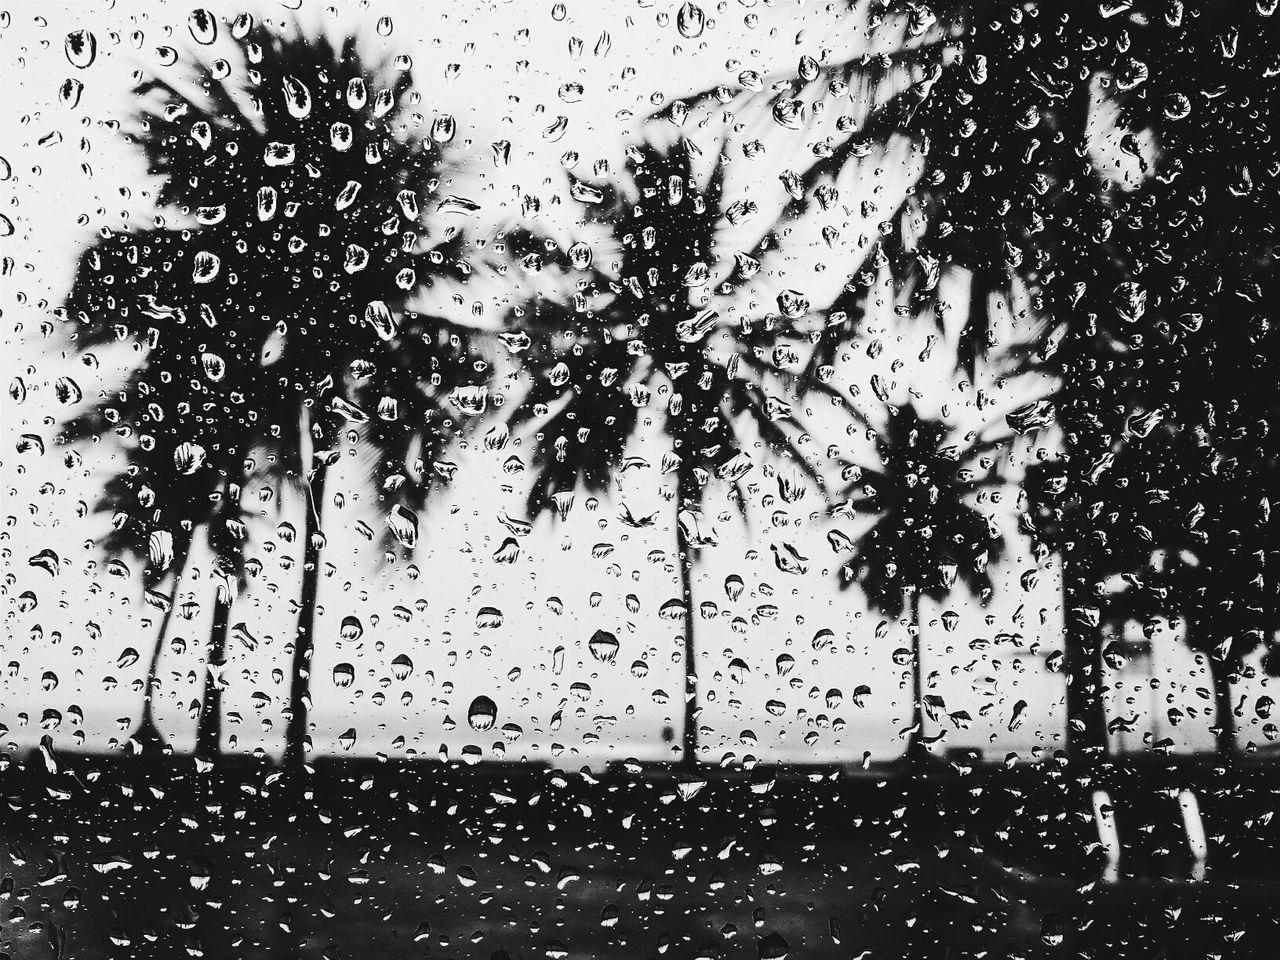 Palm trees seen through wet window